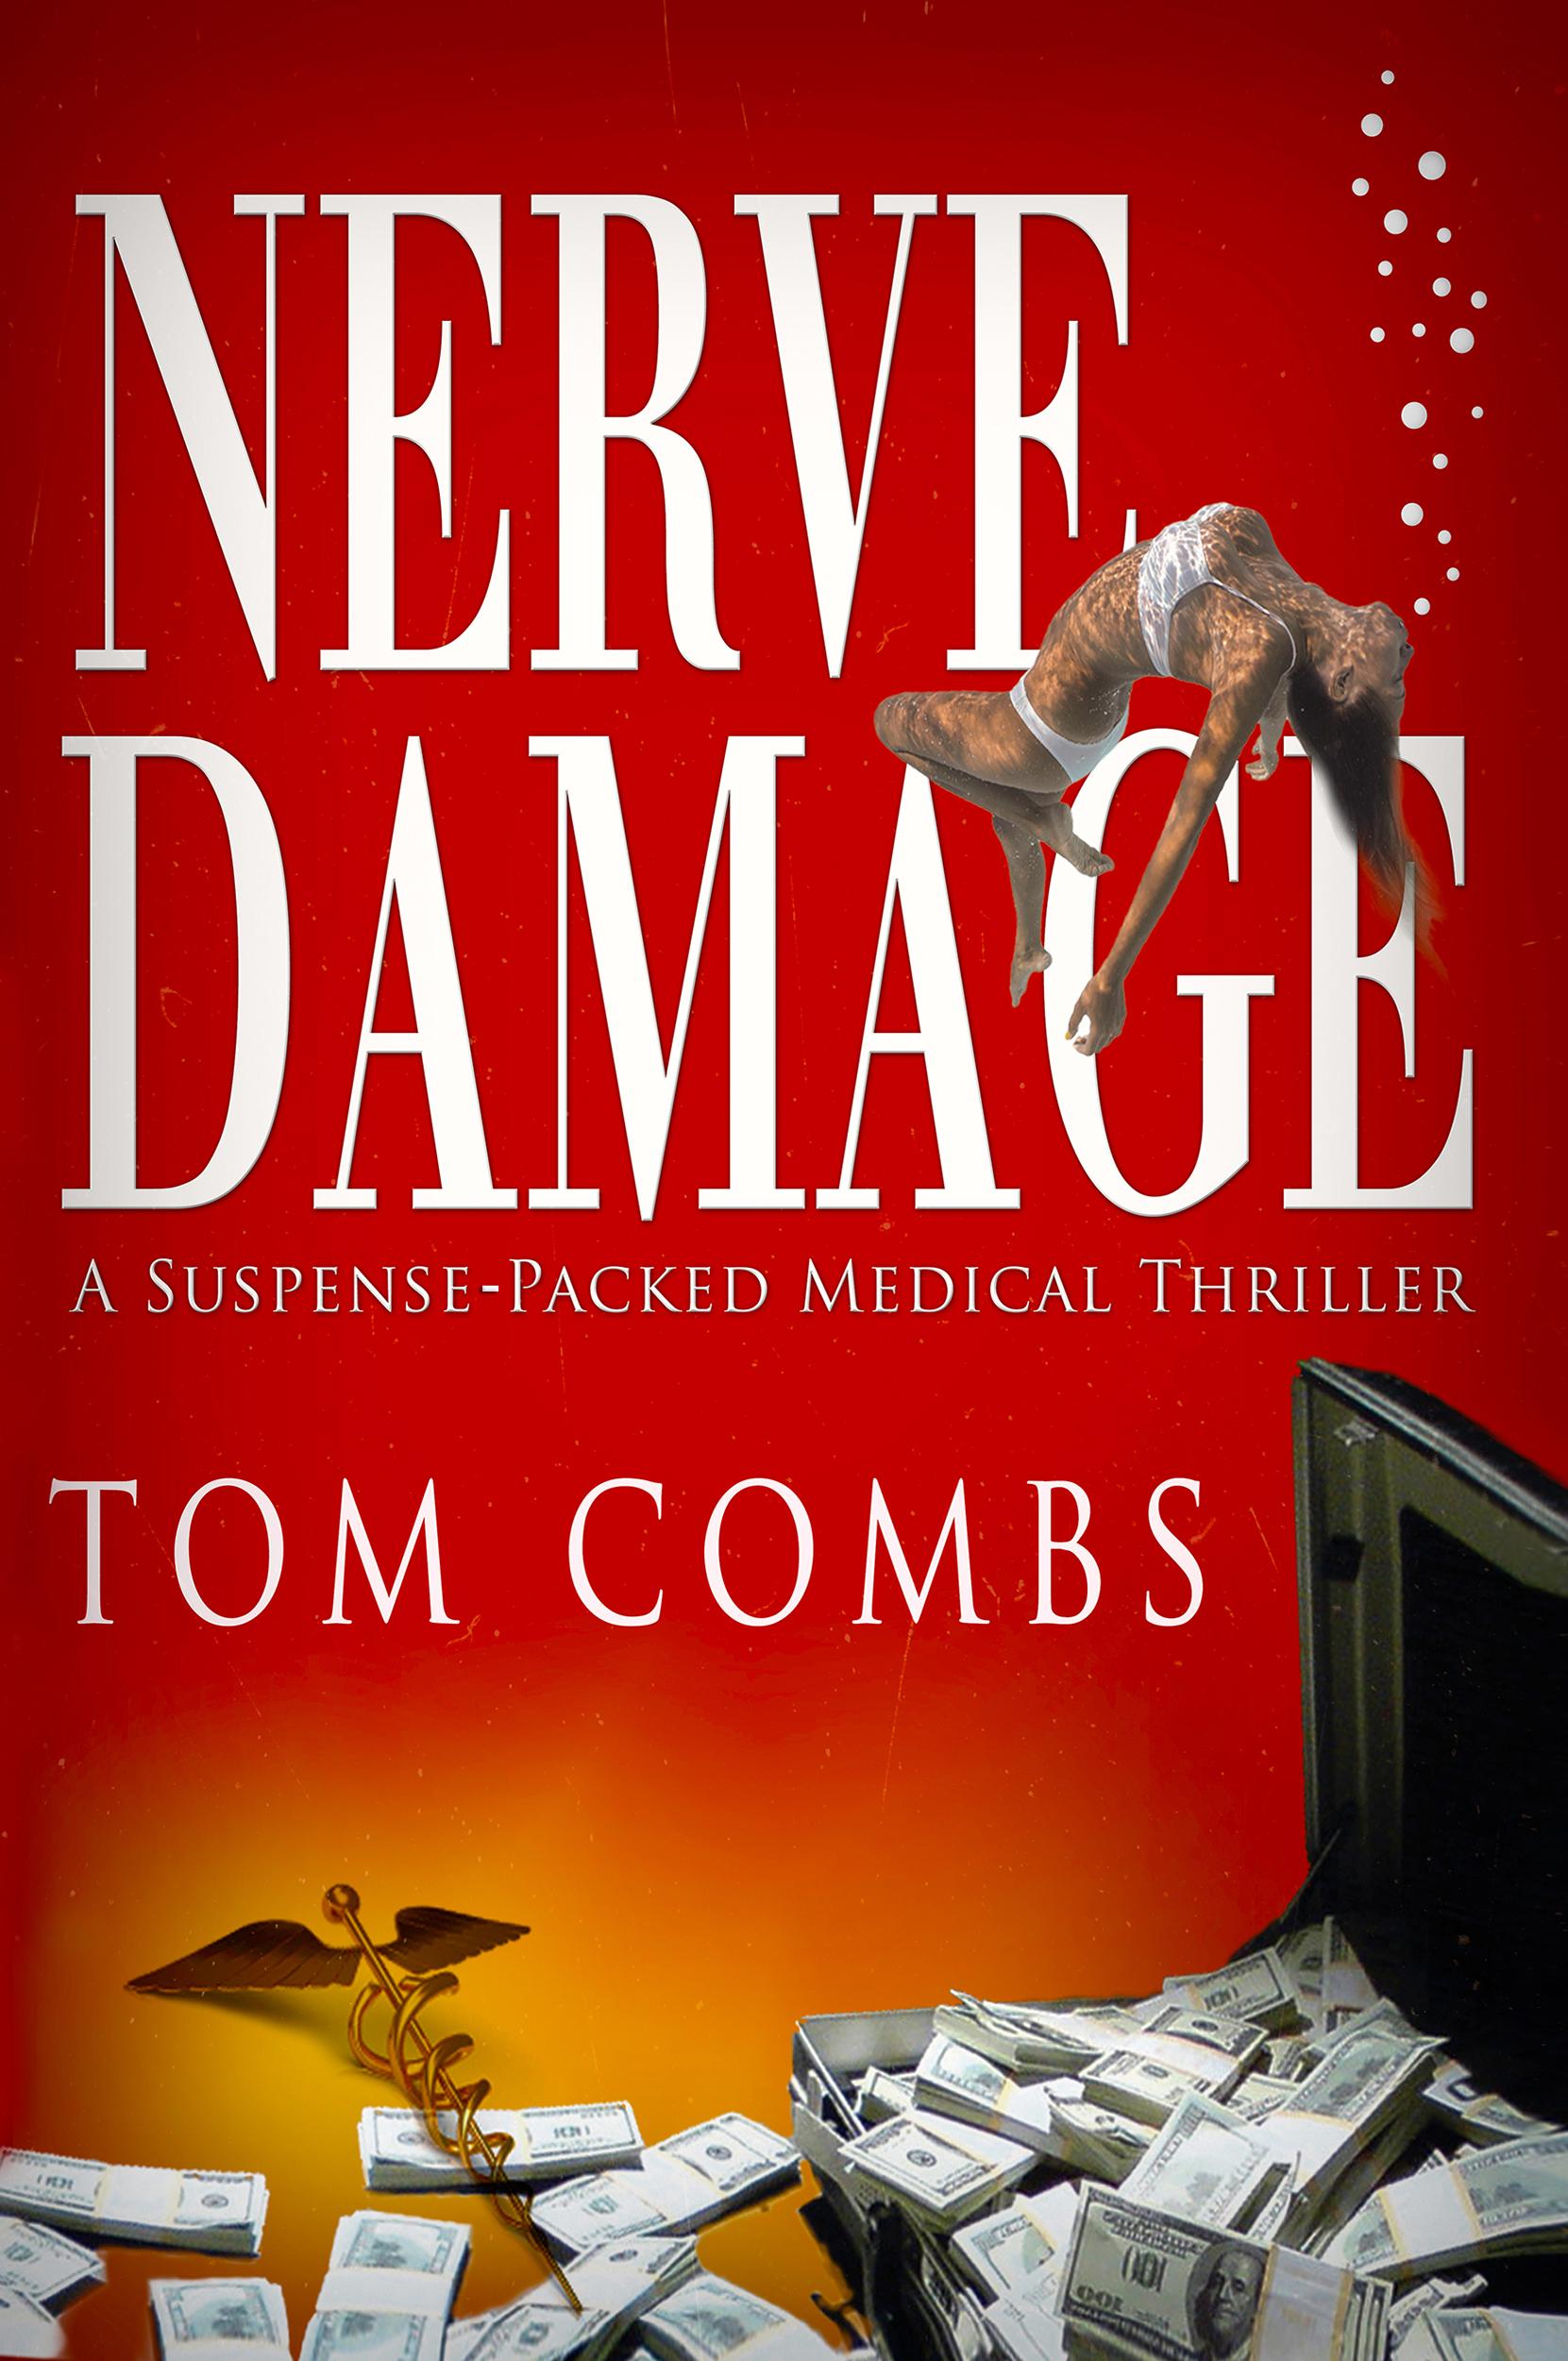 Tomc_nerve_damage_kindle_best